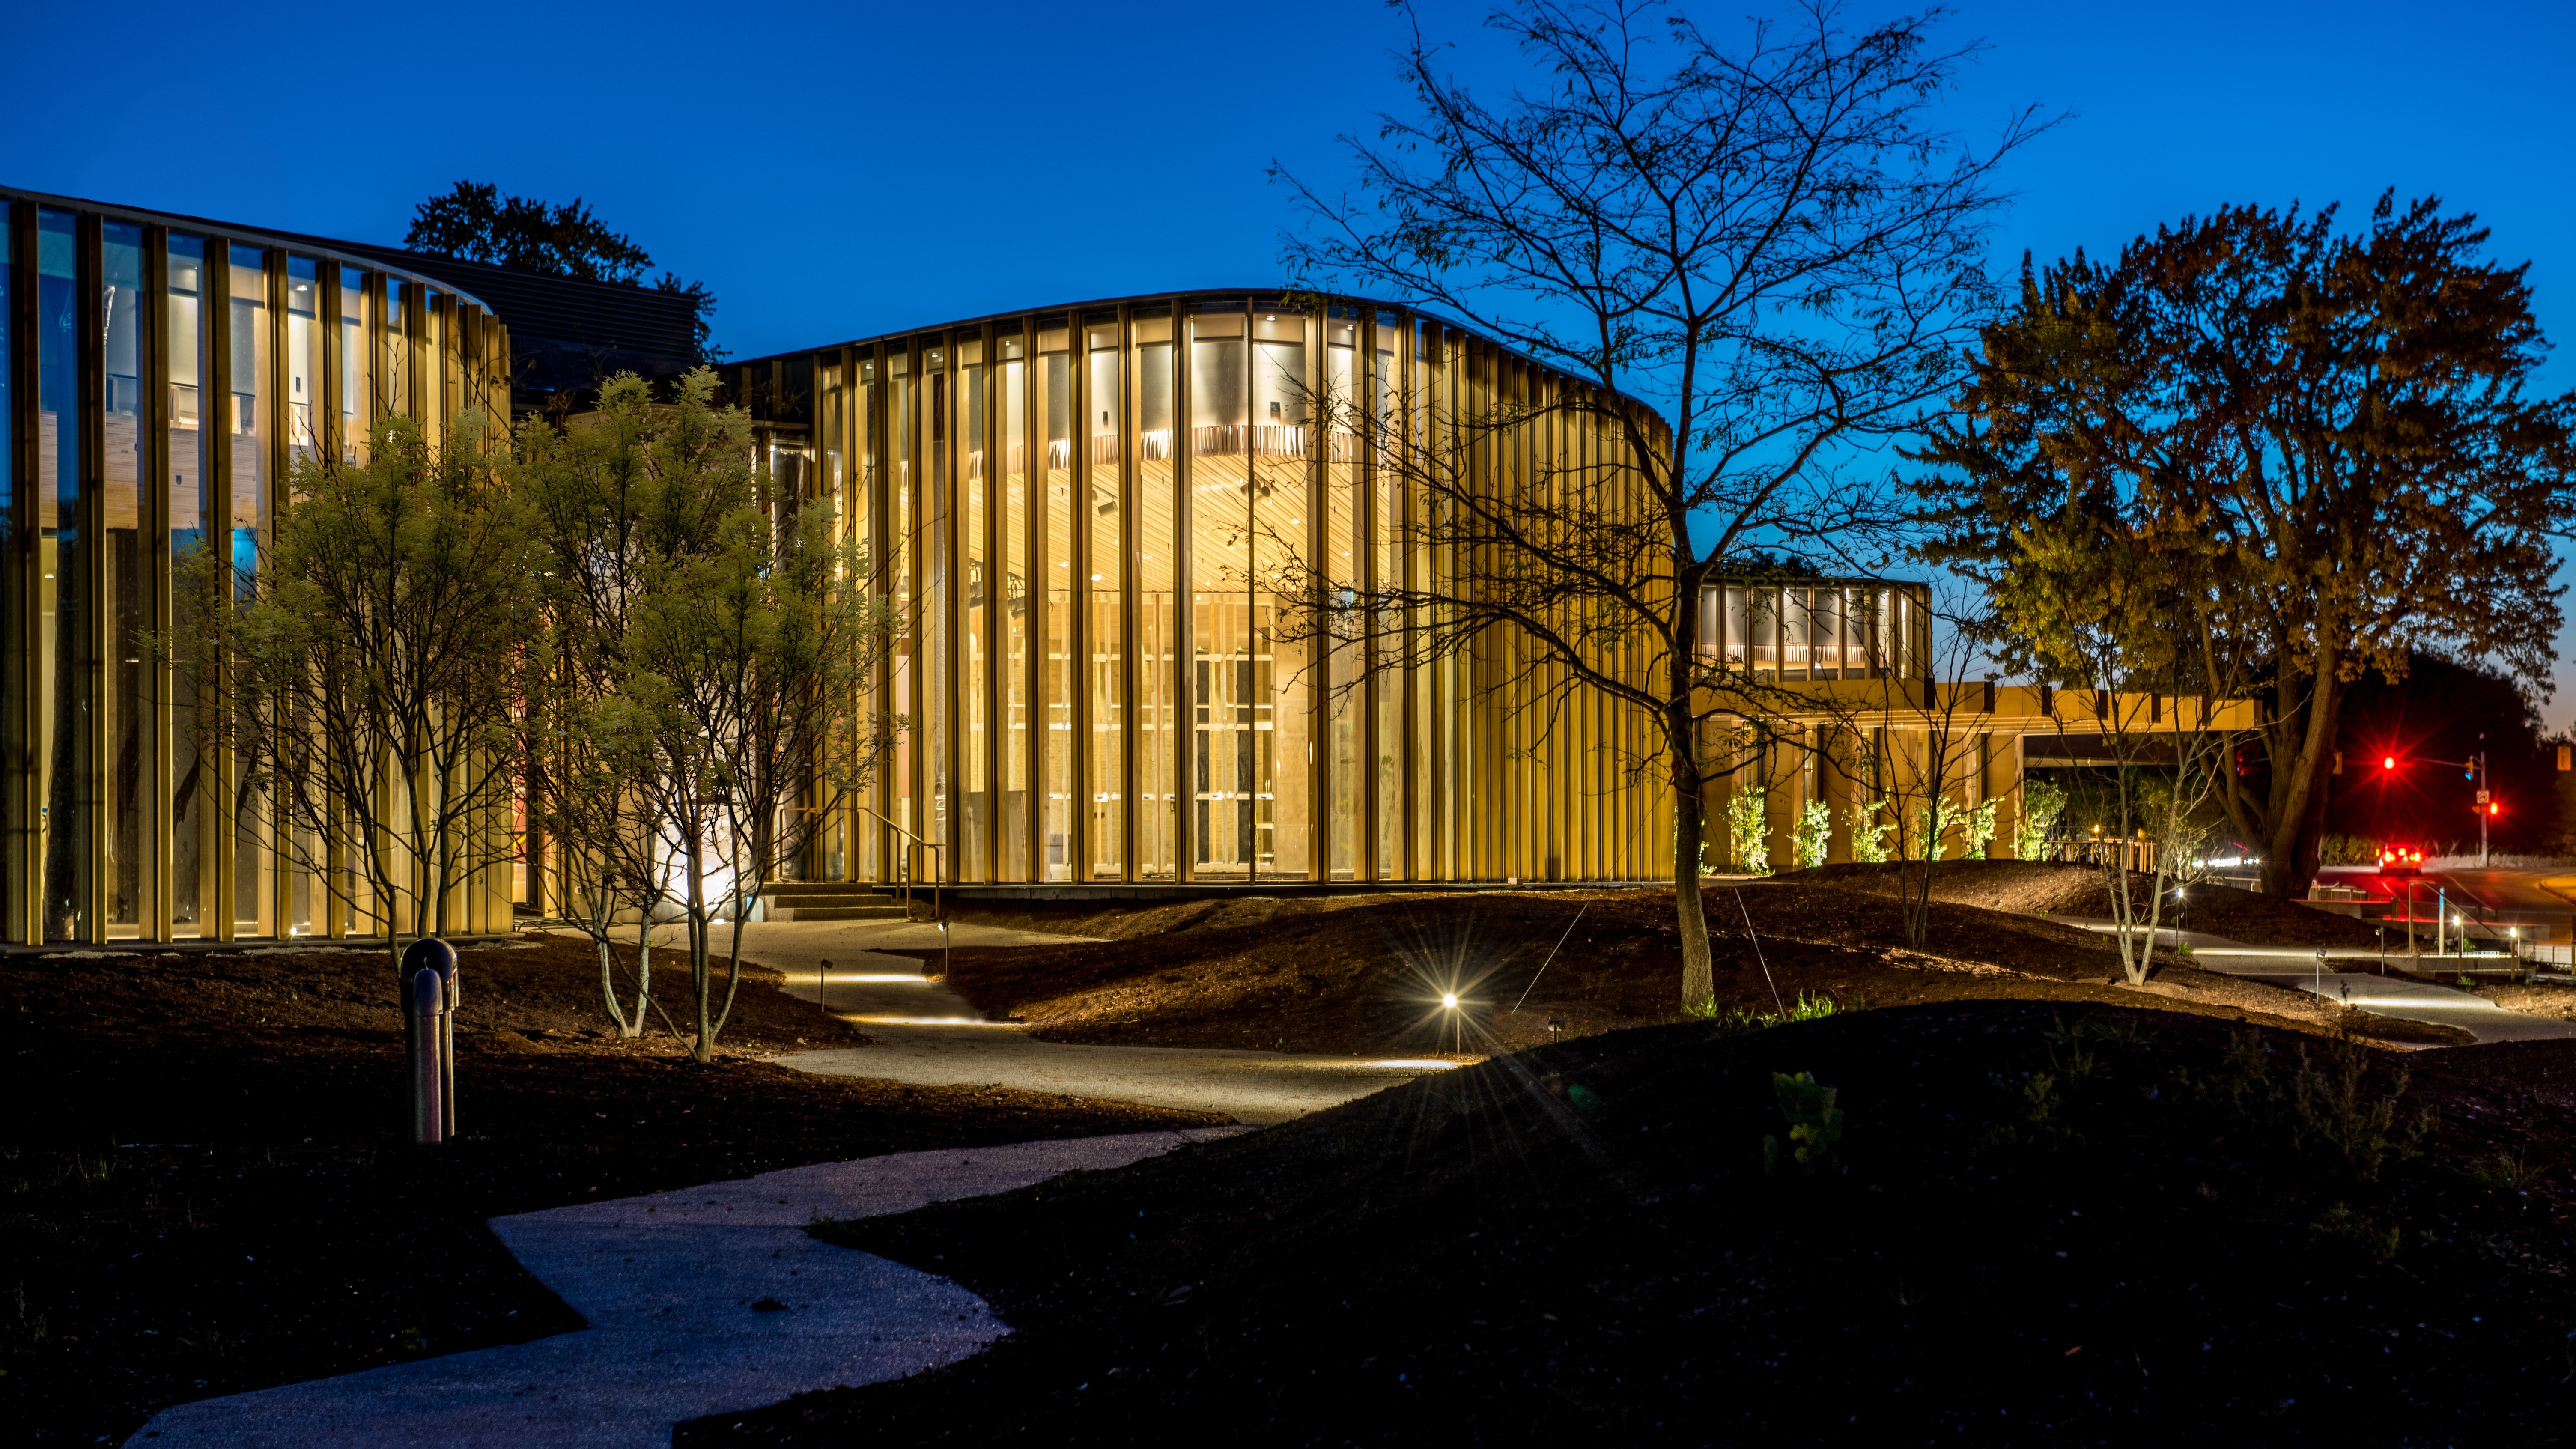 The new Tom Patterson Theatre, Lakeside Drive, Stratford, designed by Hariri Pontarini.